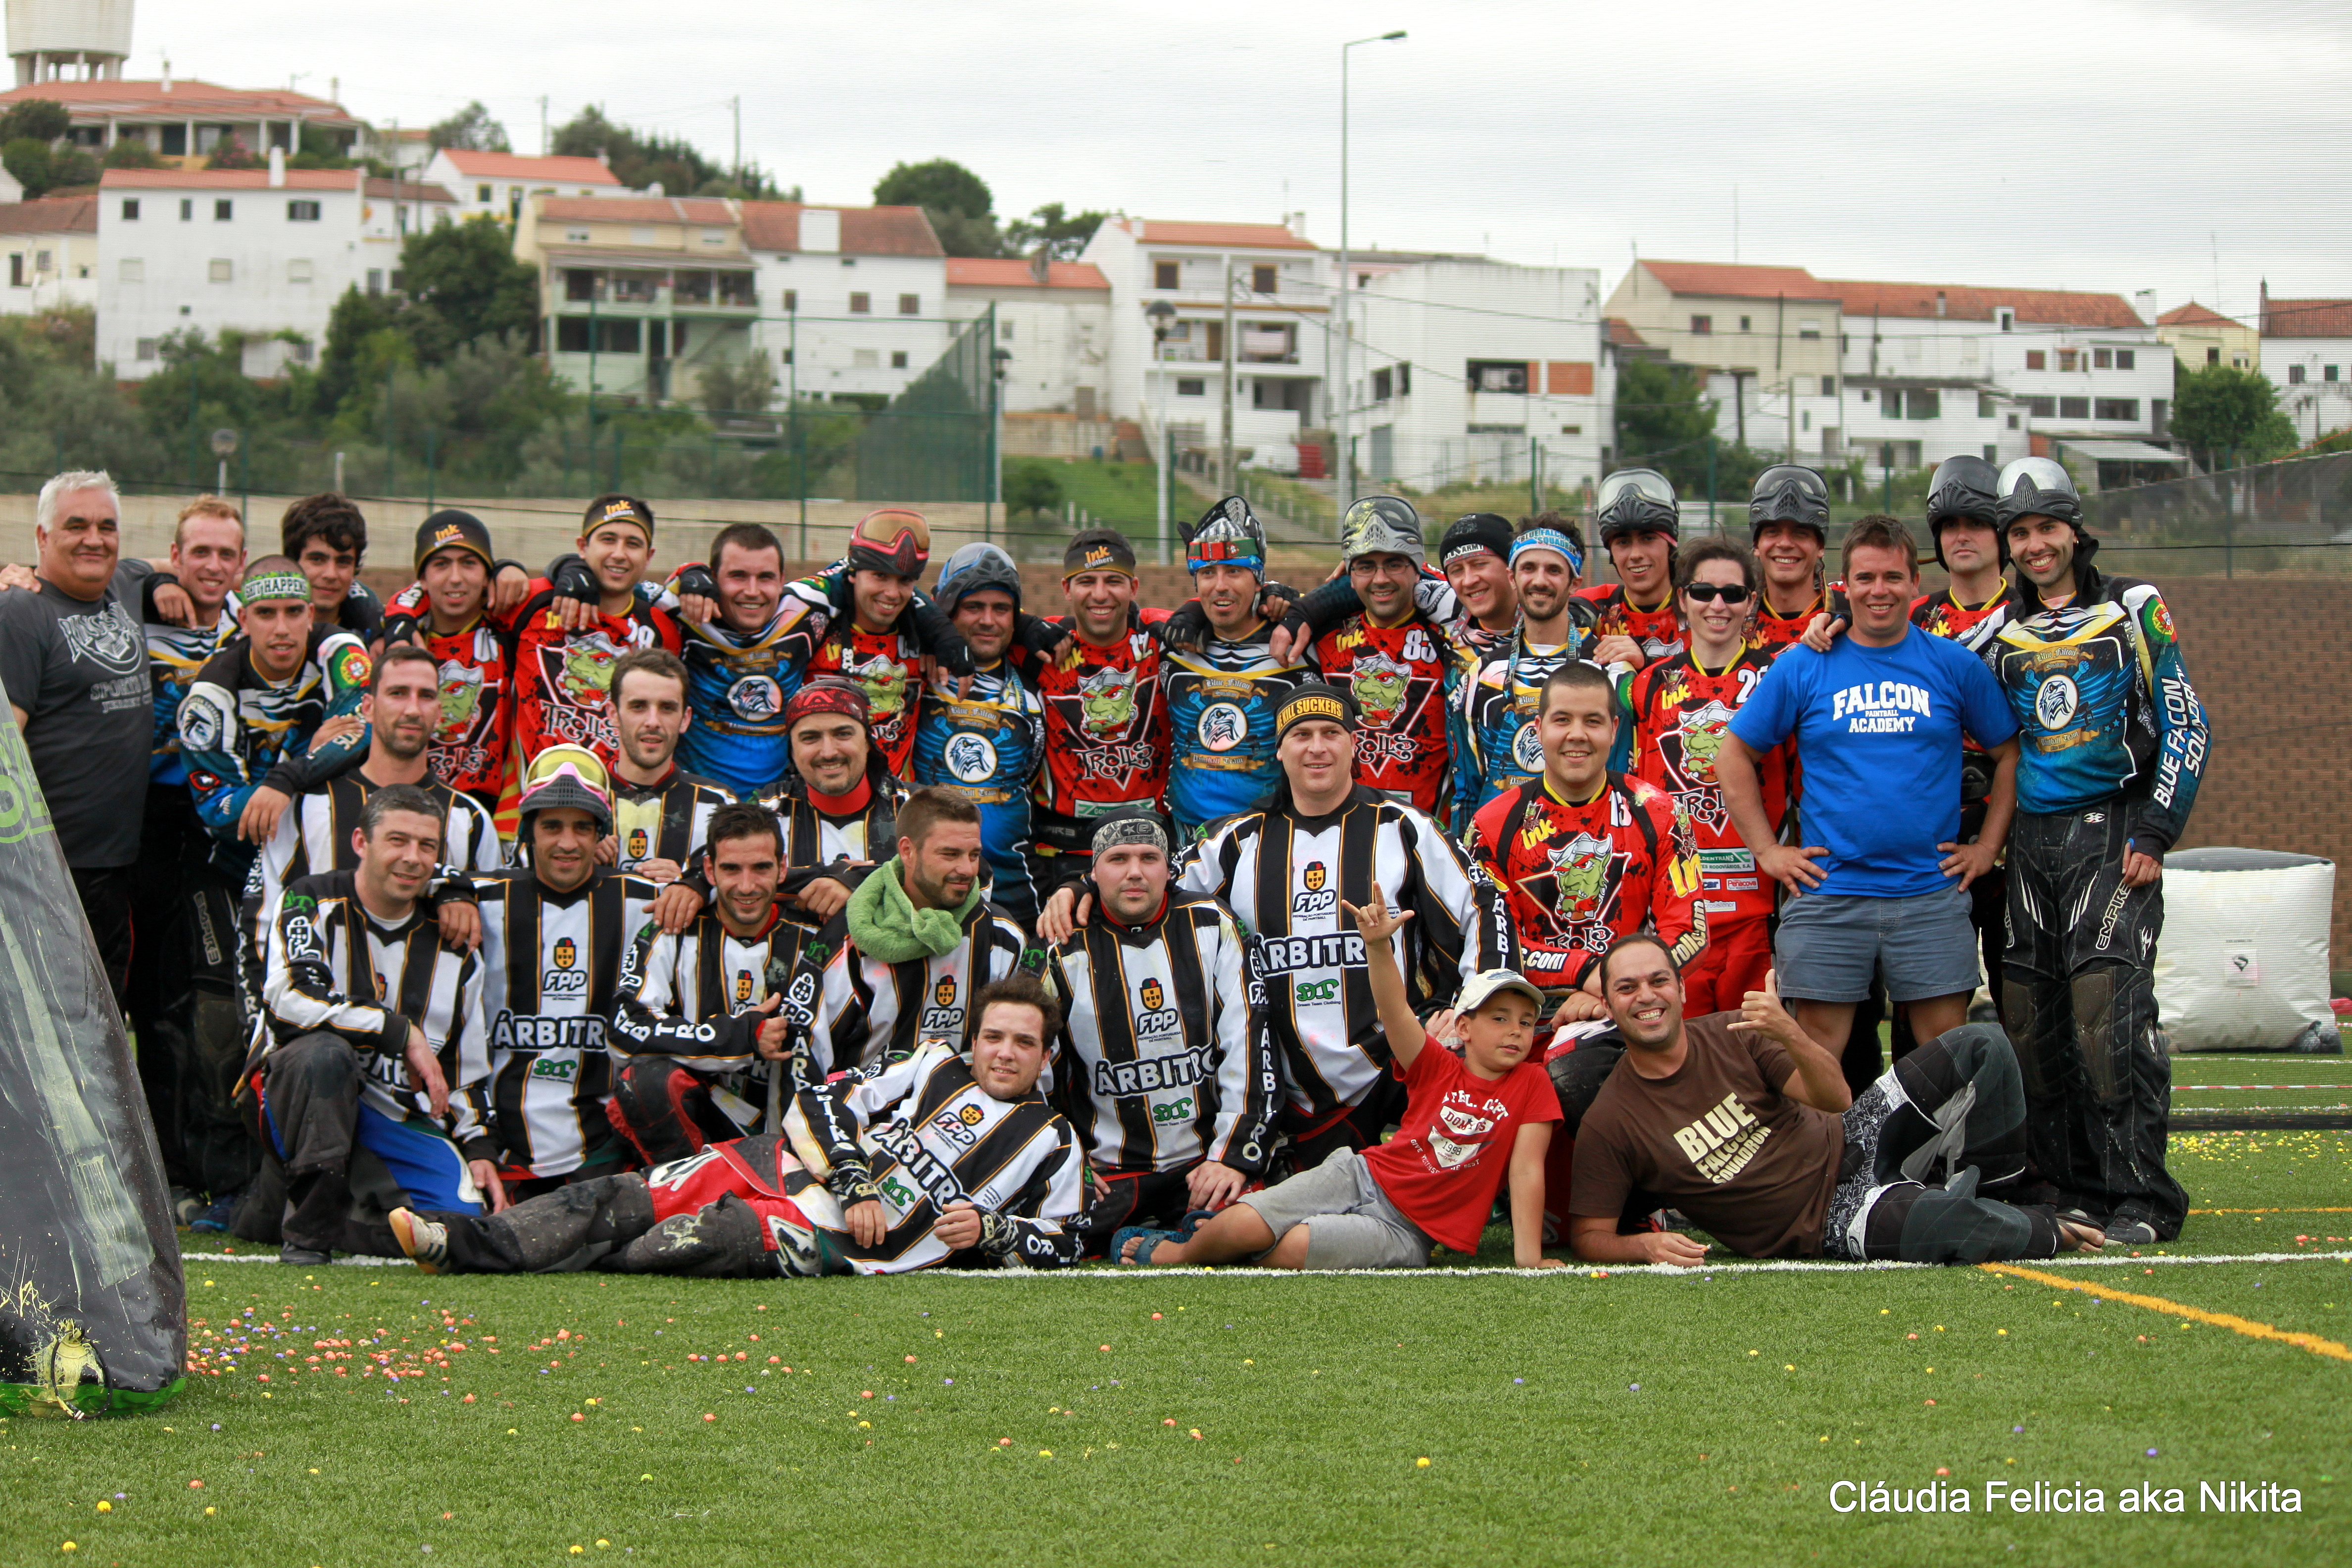 Recap of the National Portuguese Championship